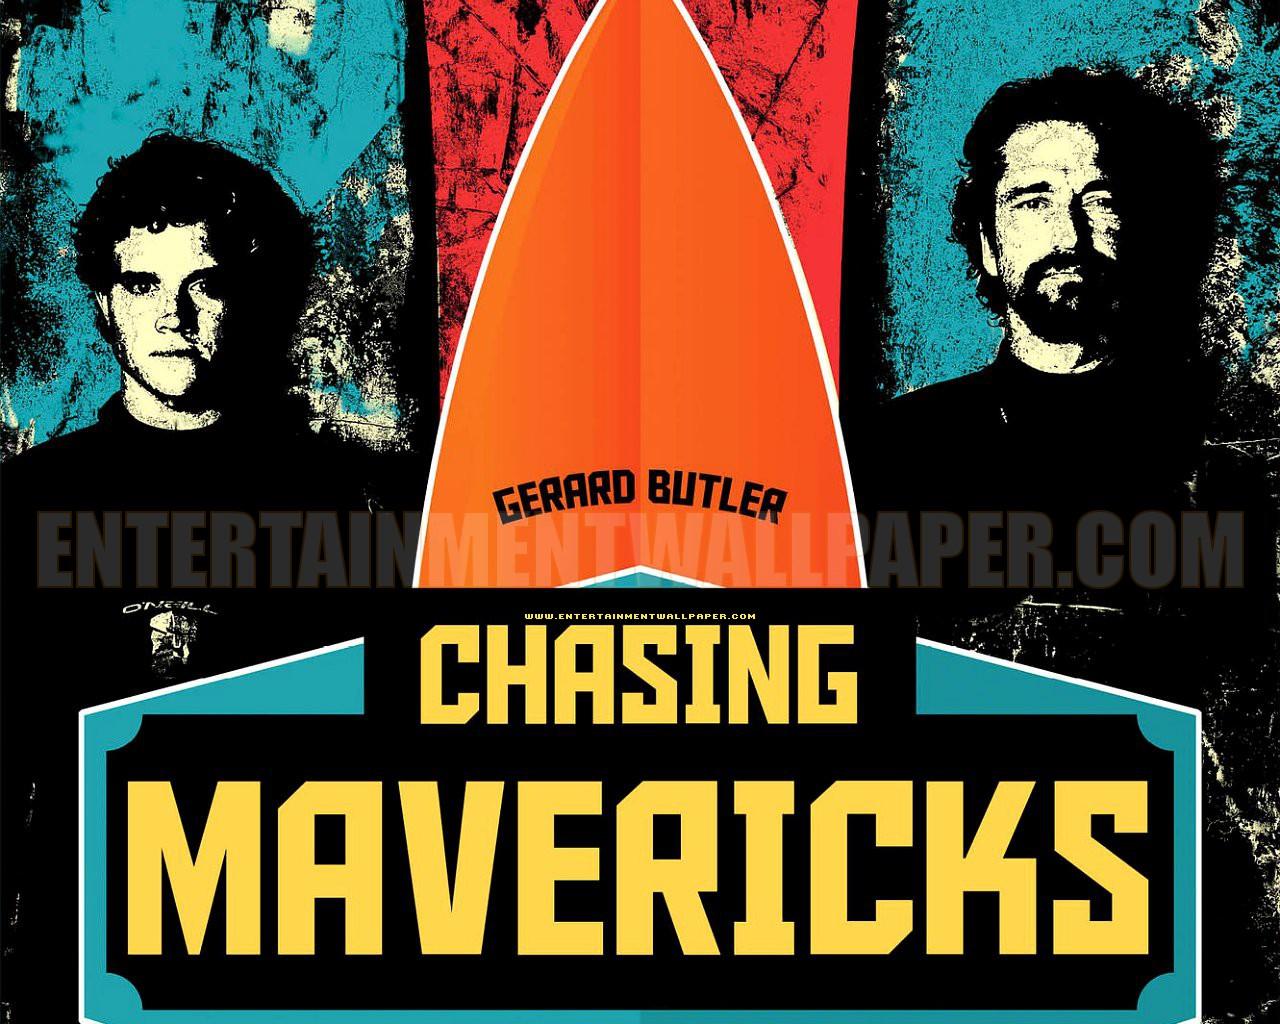 chasing-mavericks012